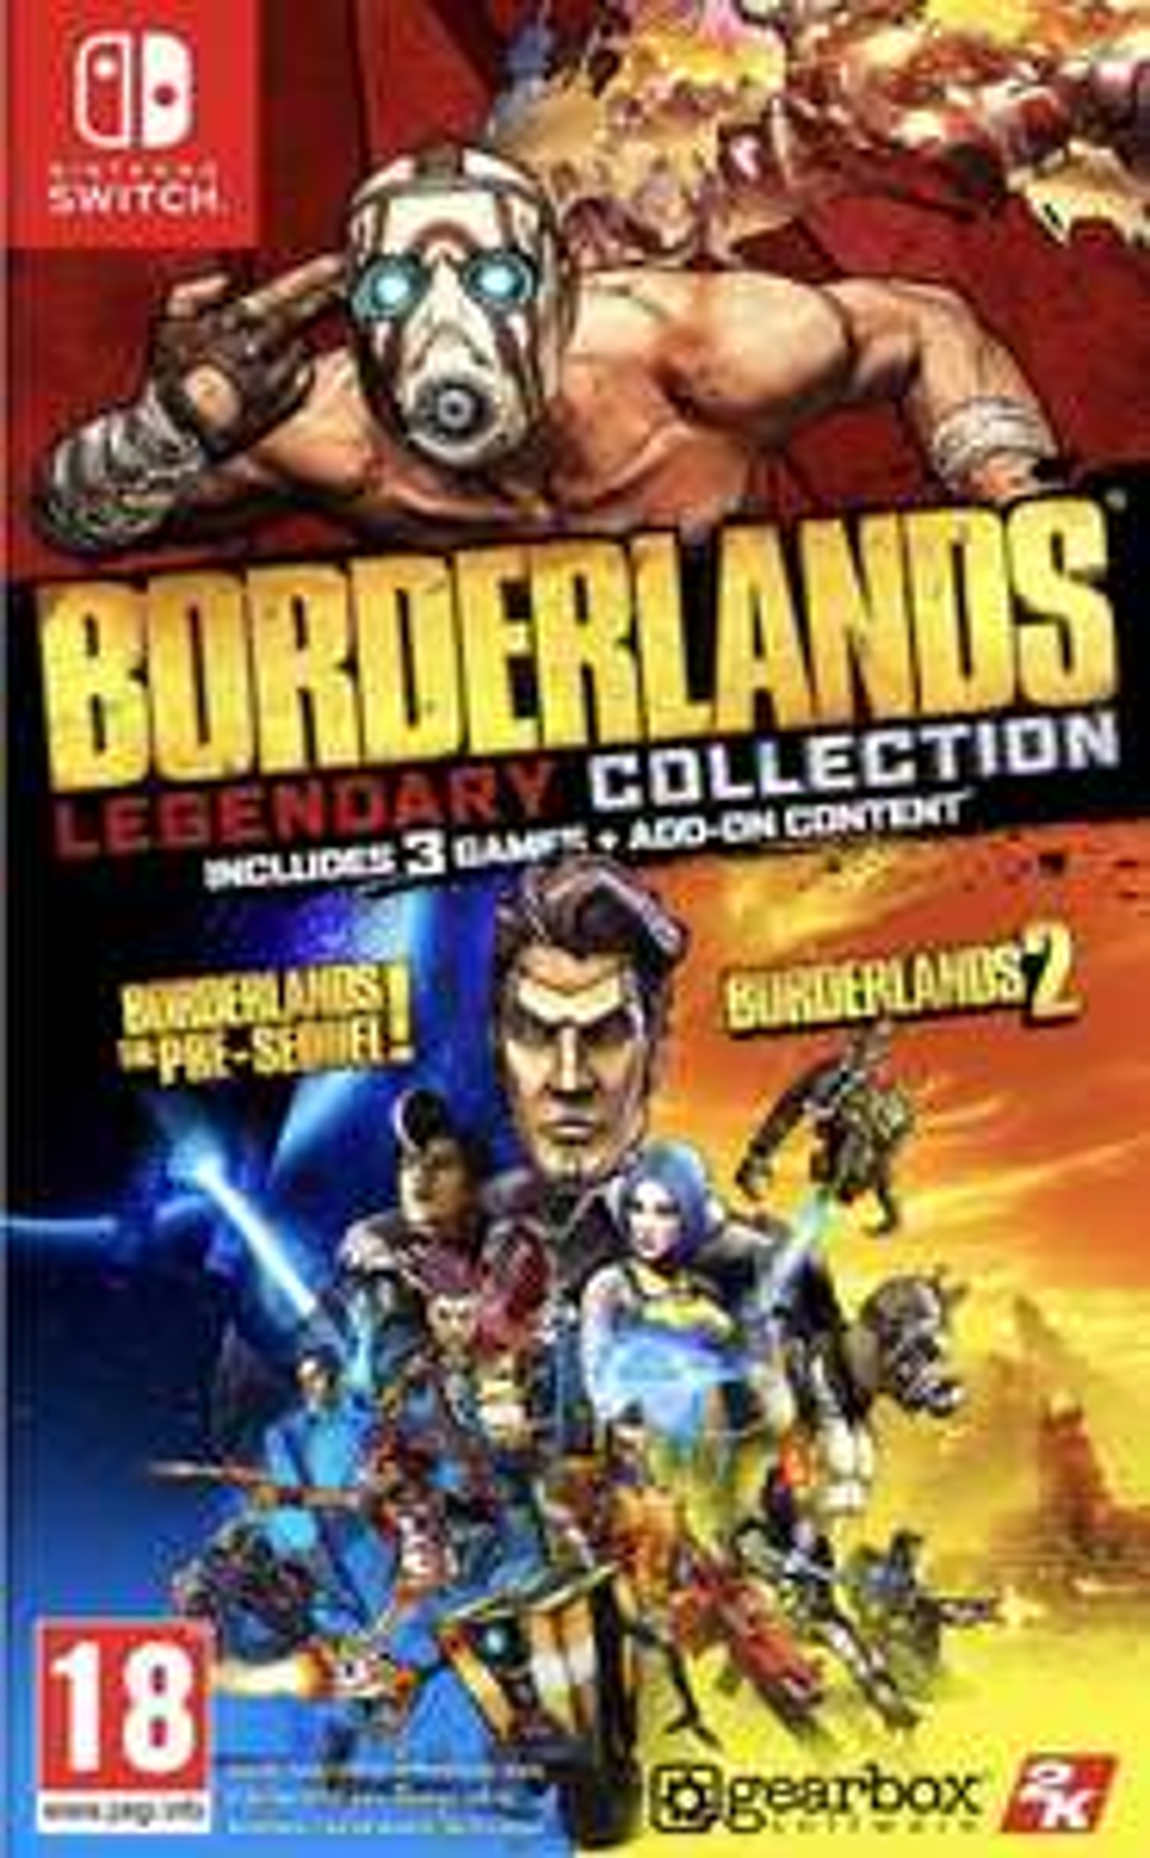 Borderlands Legendary Collection (Nintendo Switch) preorder - £33.85 @ Base